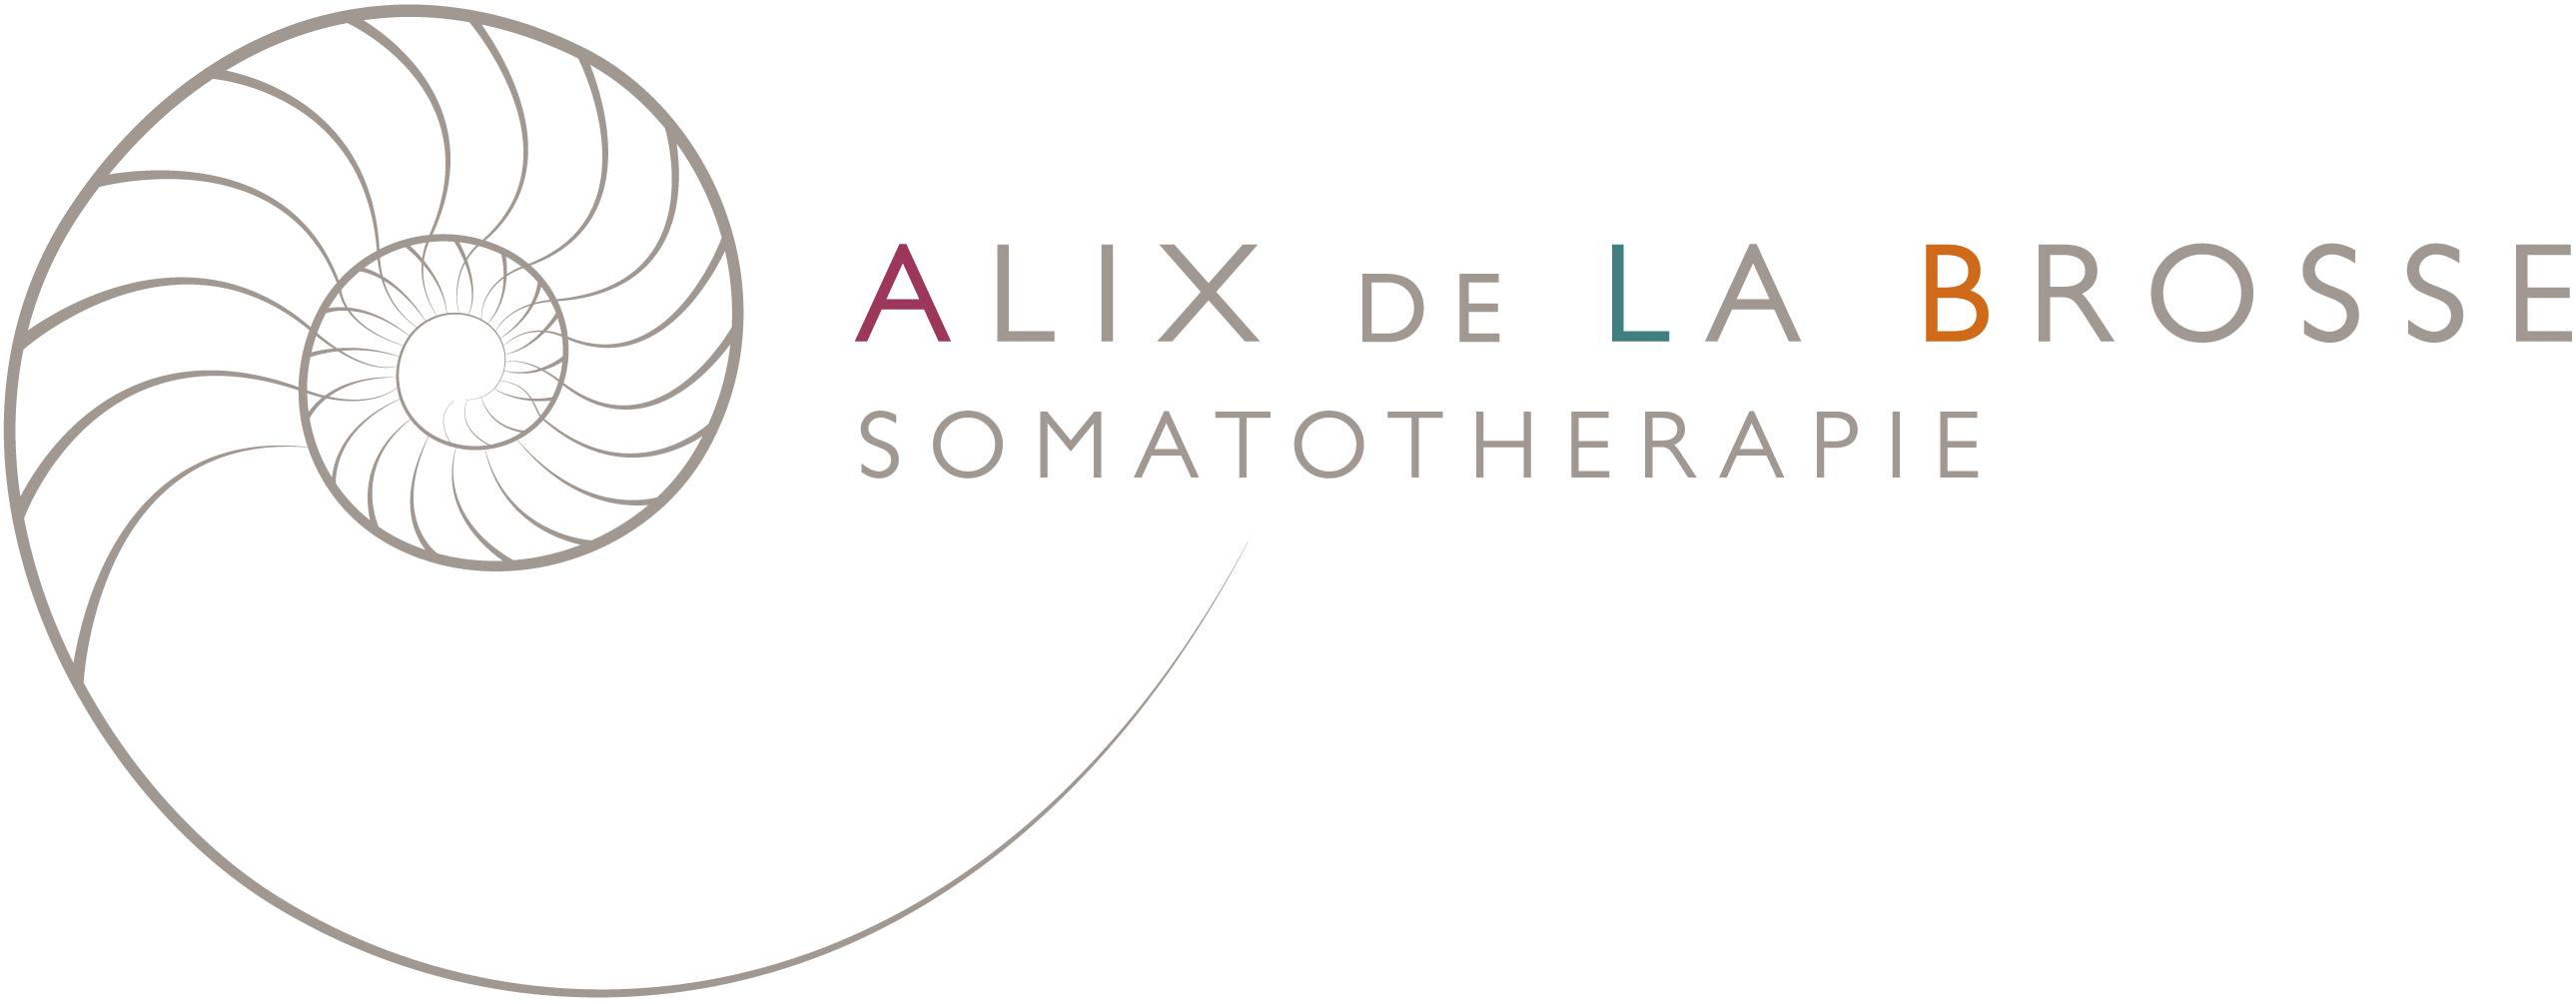 Alix de La Brosse